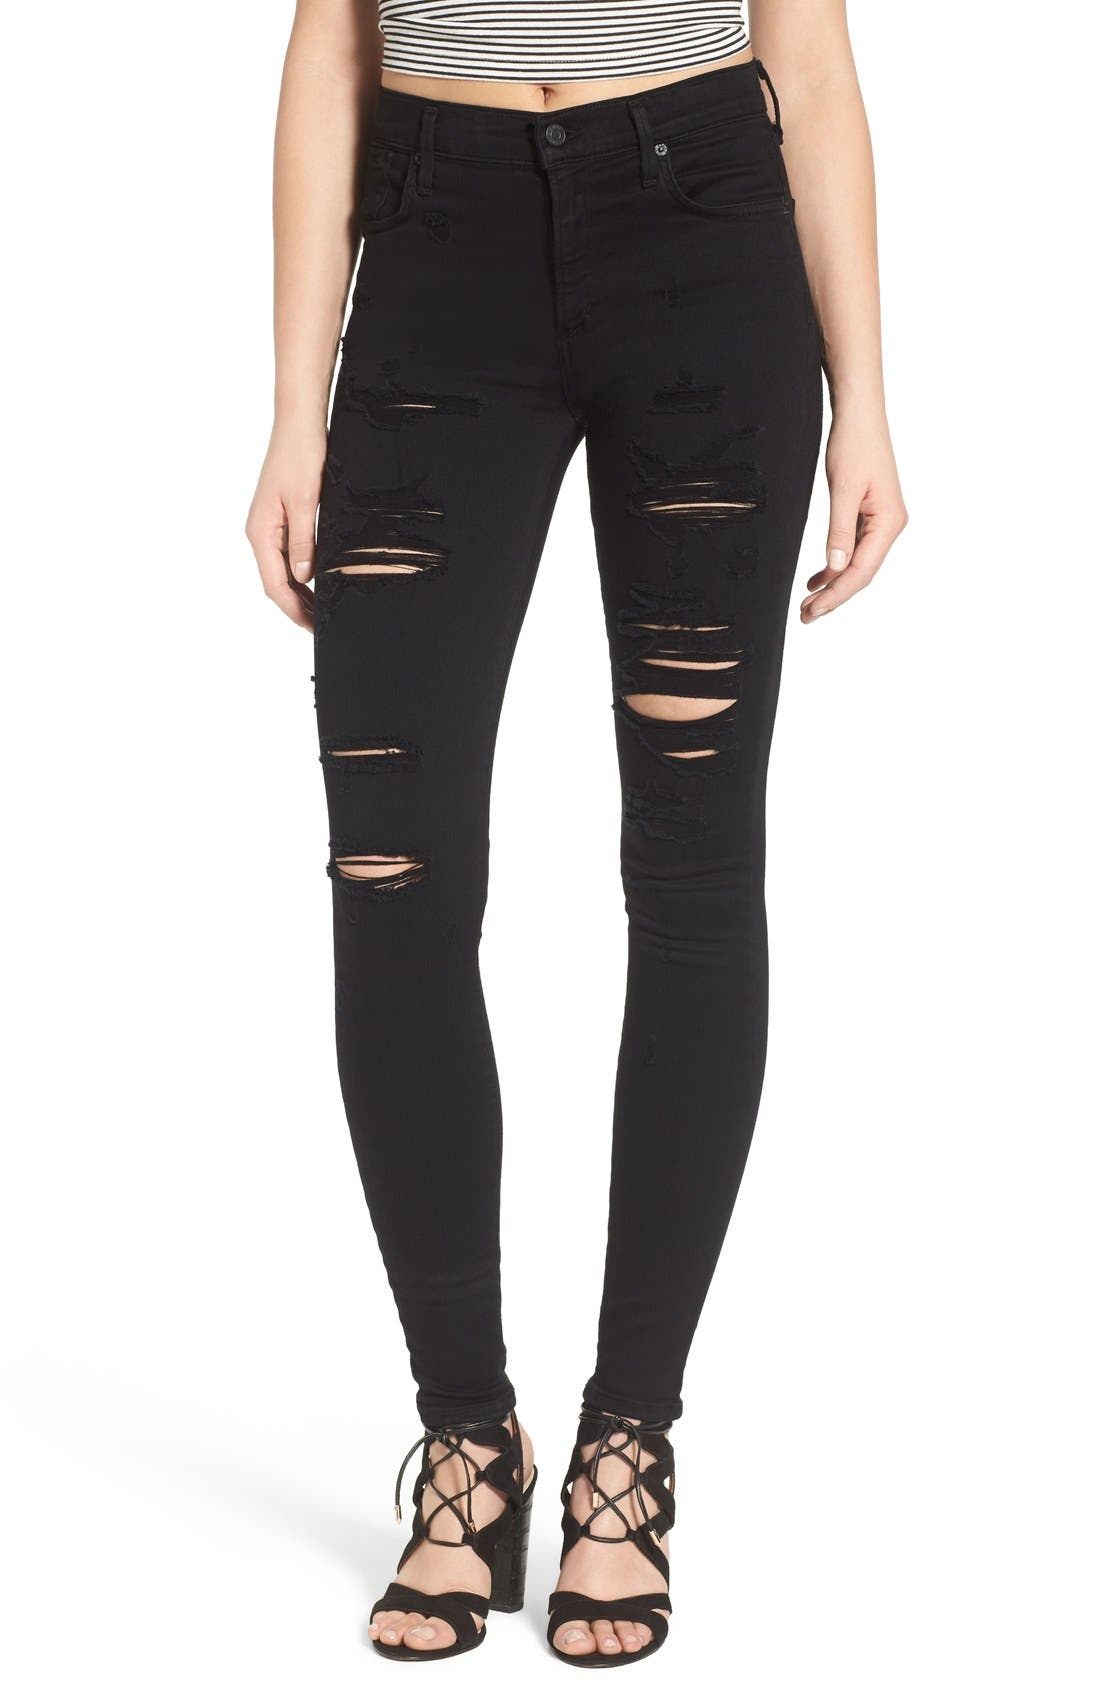 Alternate Image 1 Selected - AGOLDE Sophie High Waist Skinny Jeans (Moon Struck)